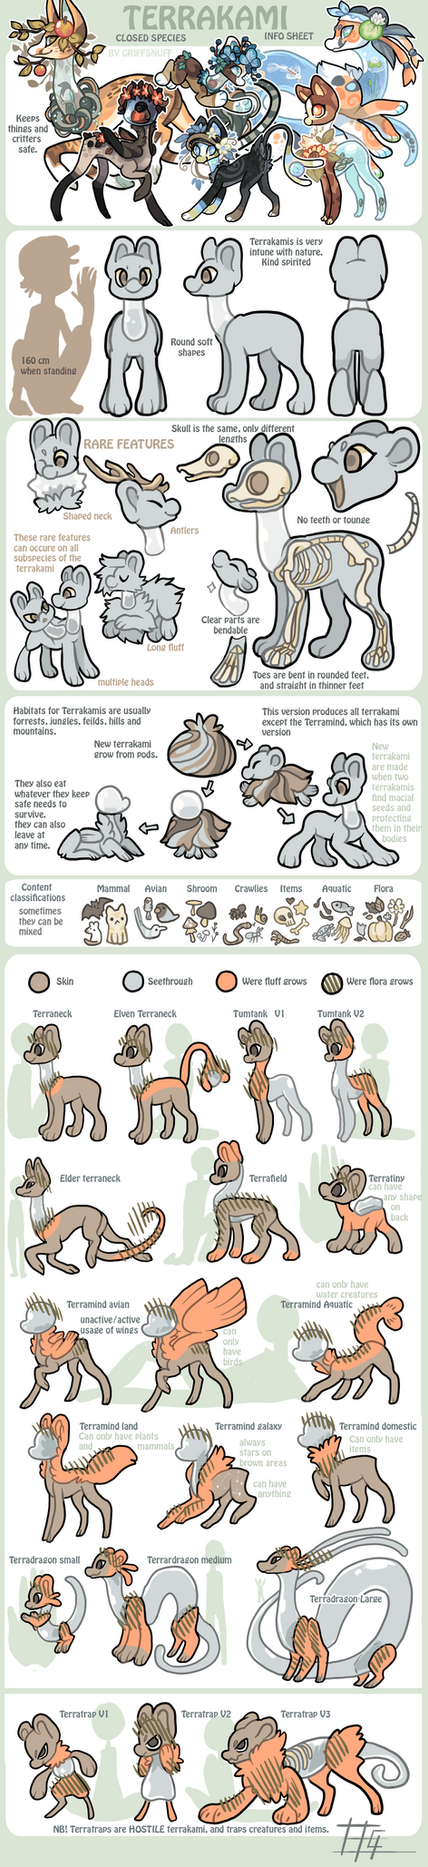 Terrakami Species sheet - CLOSED SPECIES by griffsnuff